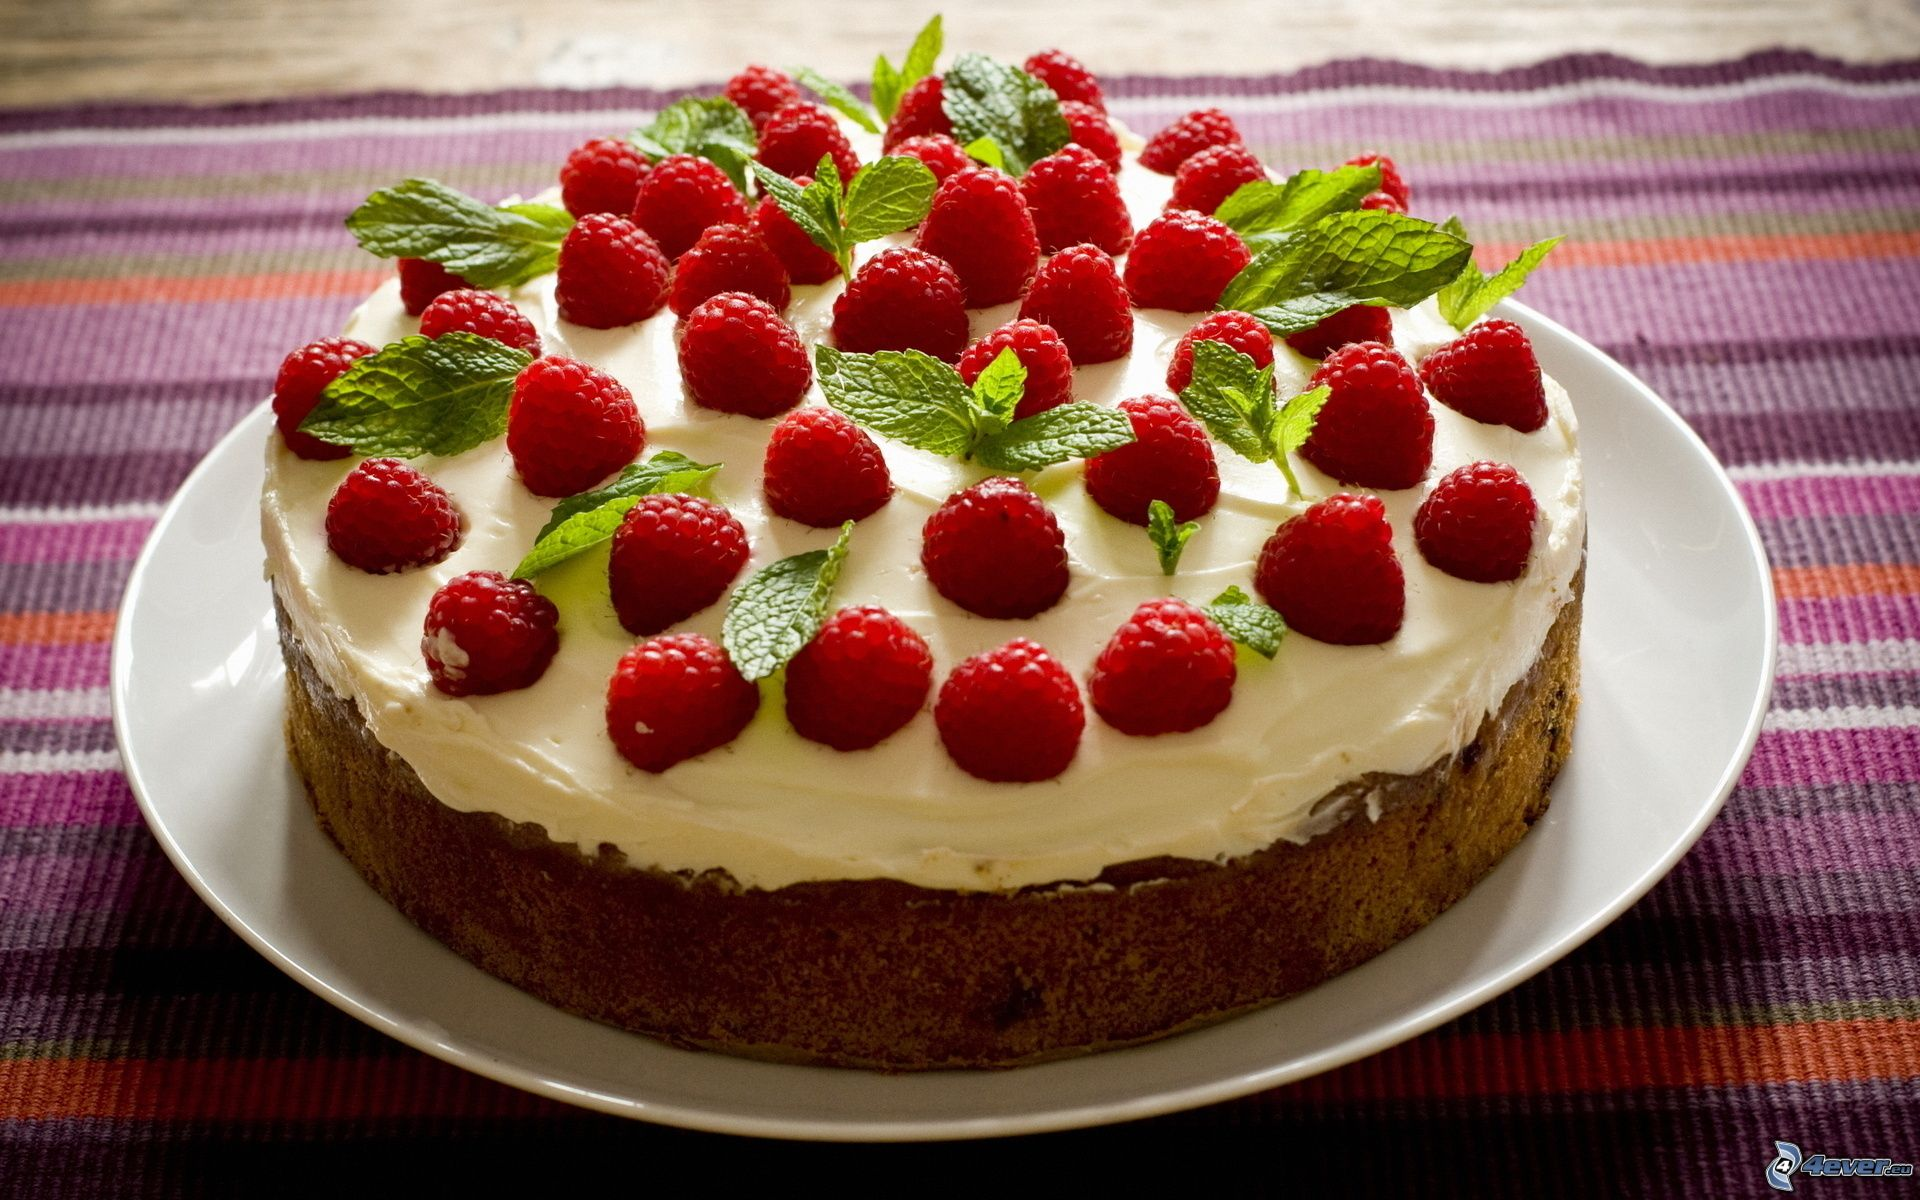 Kuchen Bilder kuchen 160246 jpg